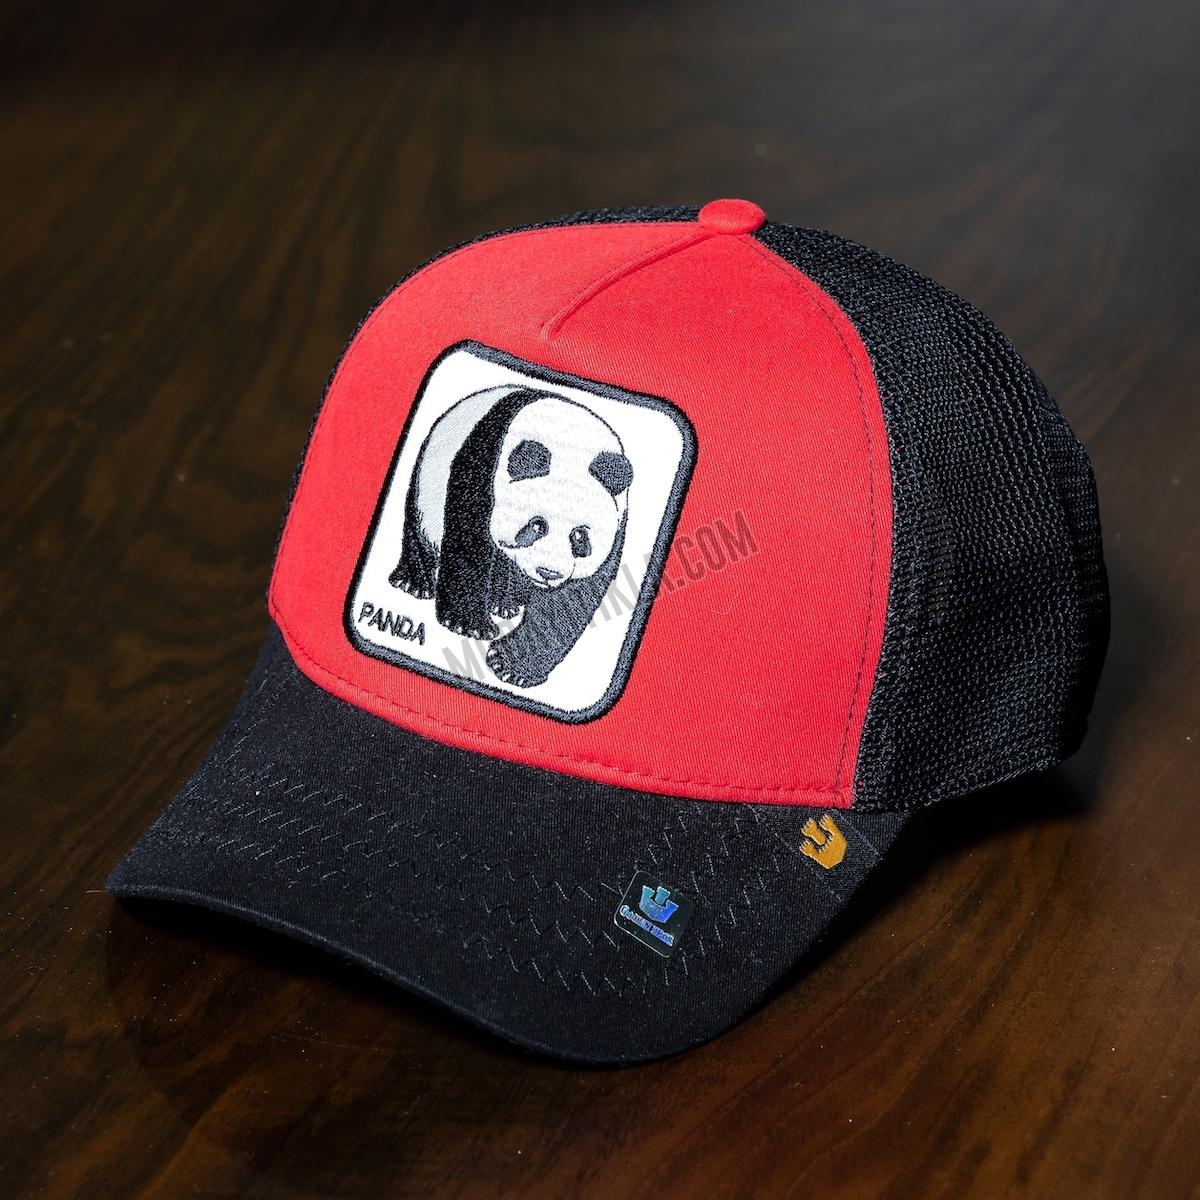 Erkek Kırmızı-Siyah İthal Gooring Bross Panda Şapka